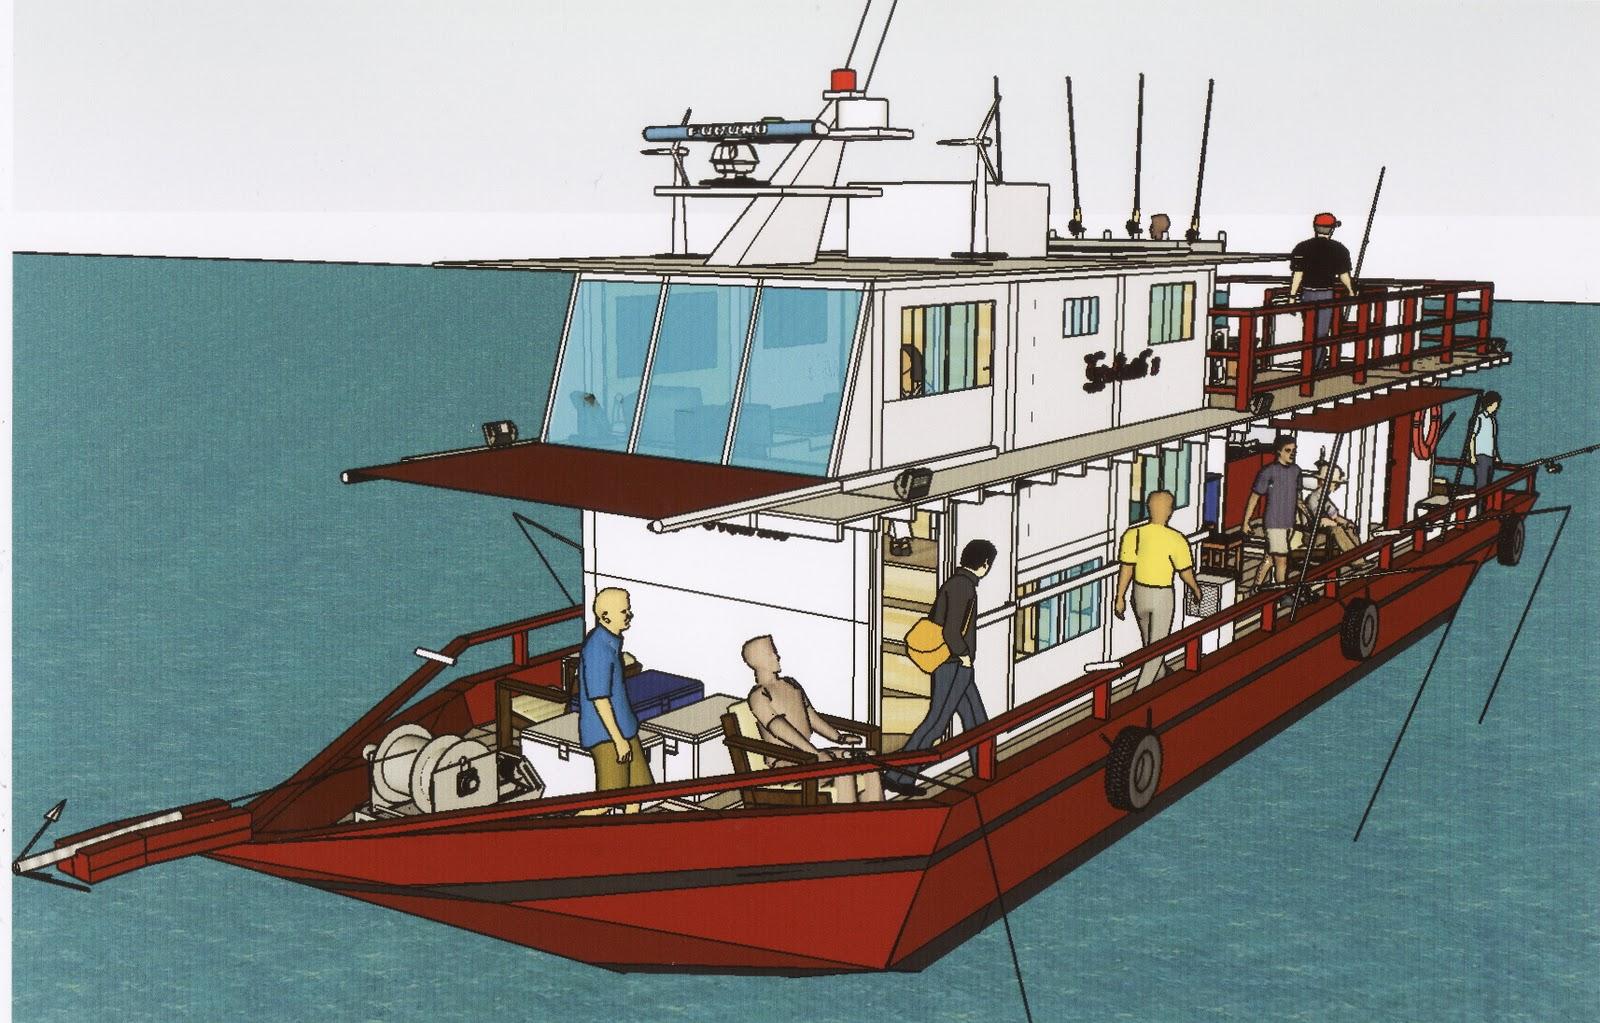 Diy boat building trip to kudat sabah for Build fishing boat